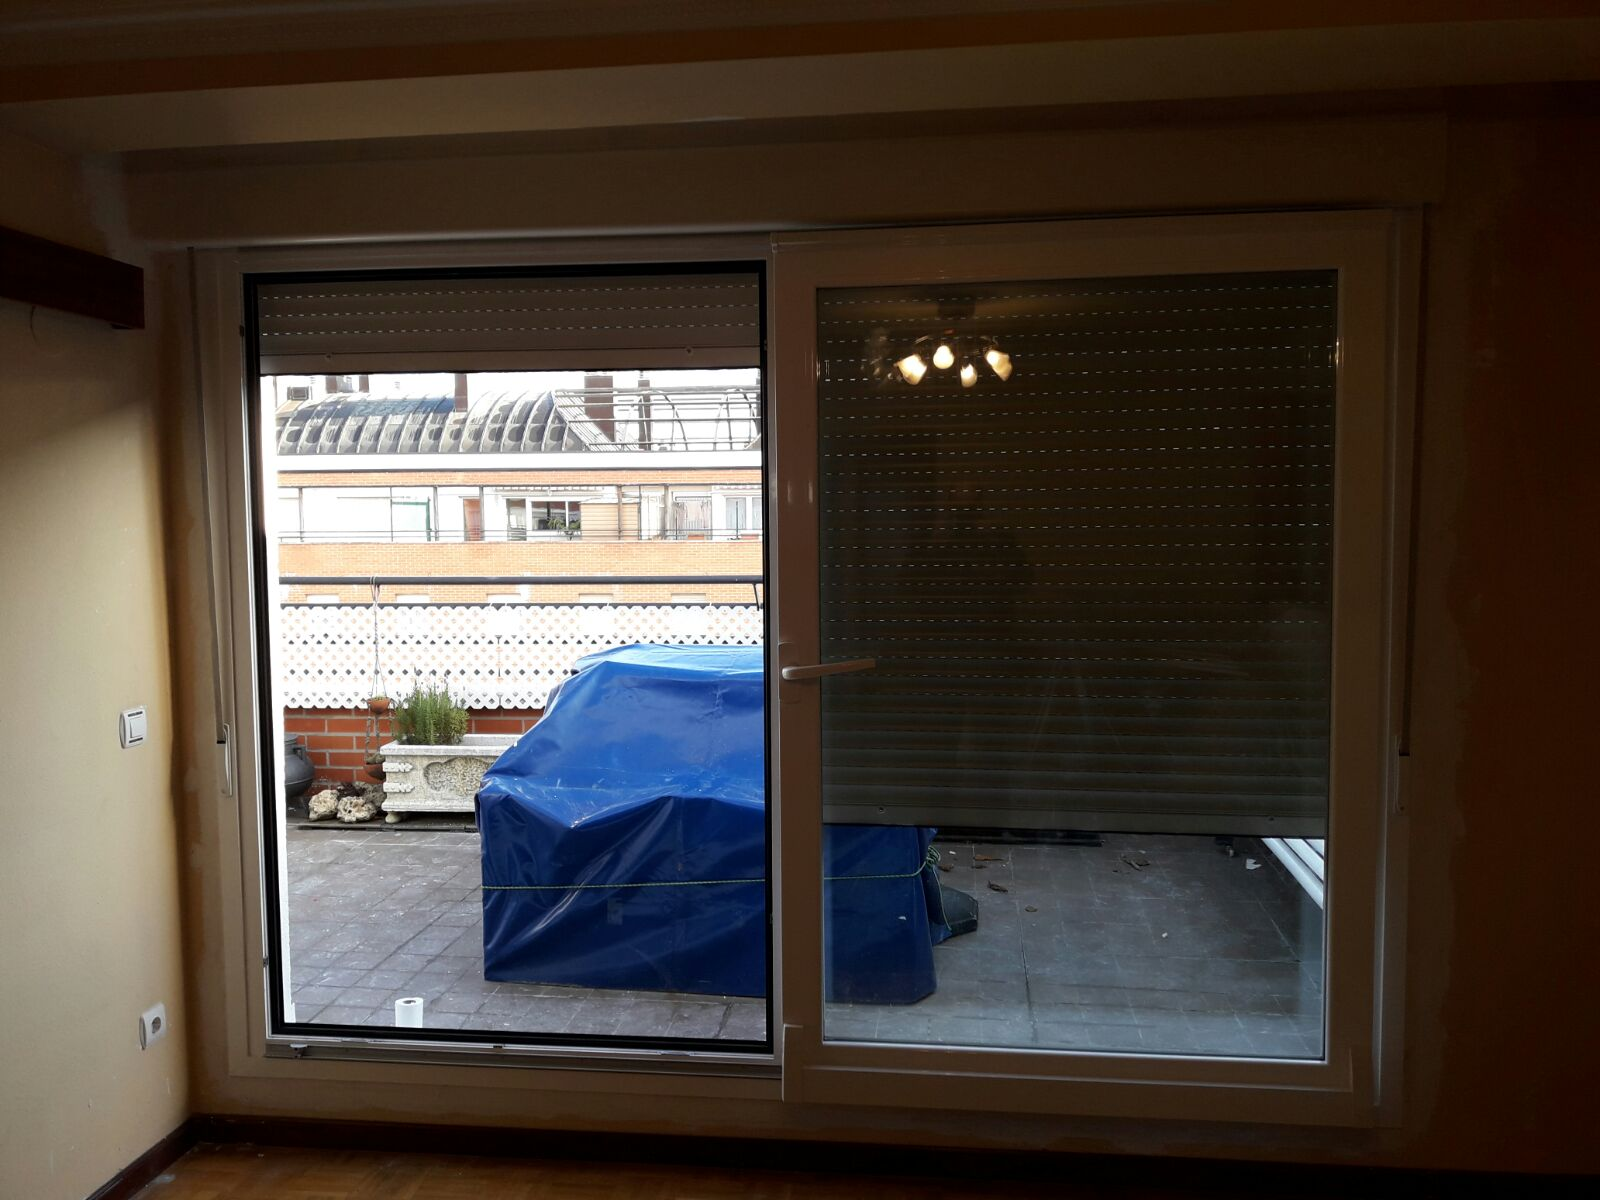 Puerta ventana de aluminio latest puerta ventana balcon for Puerta osciloparalela